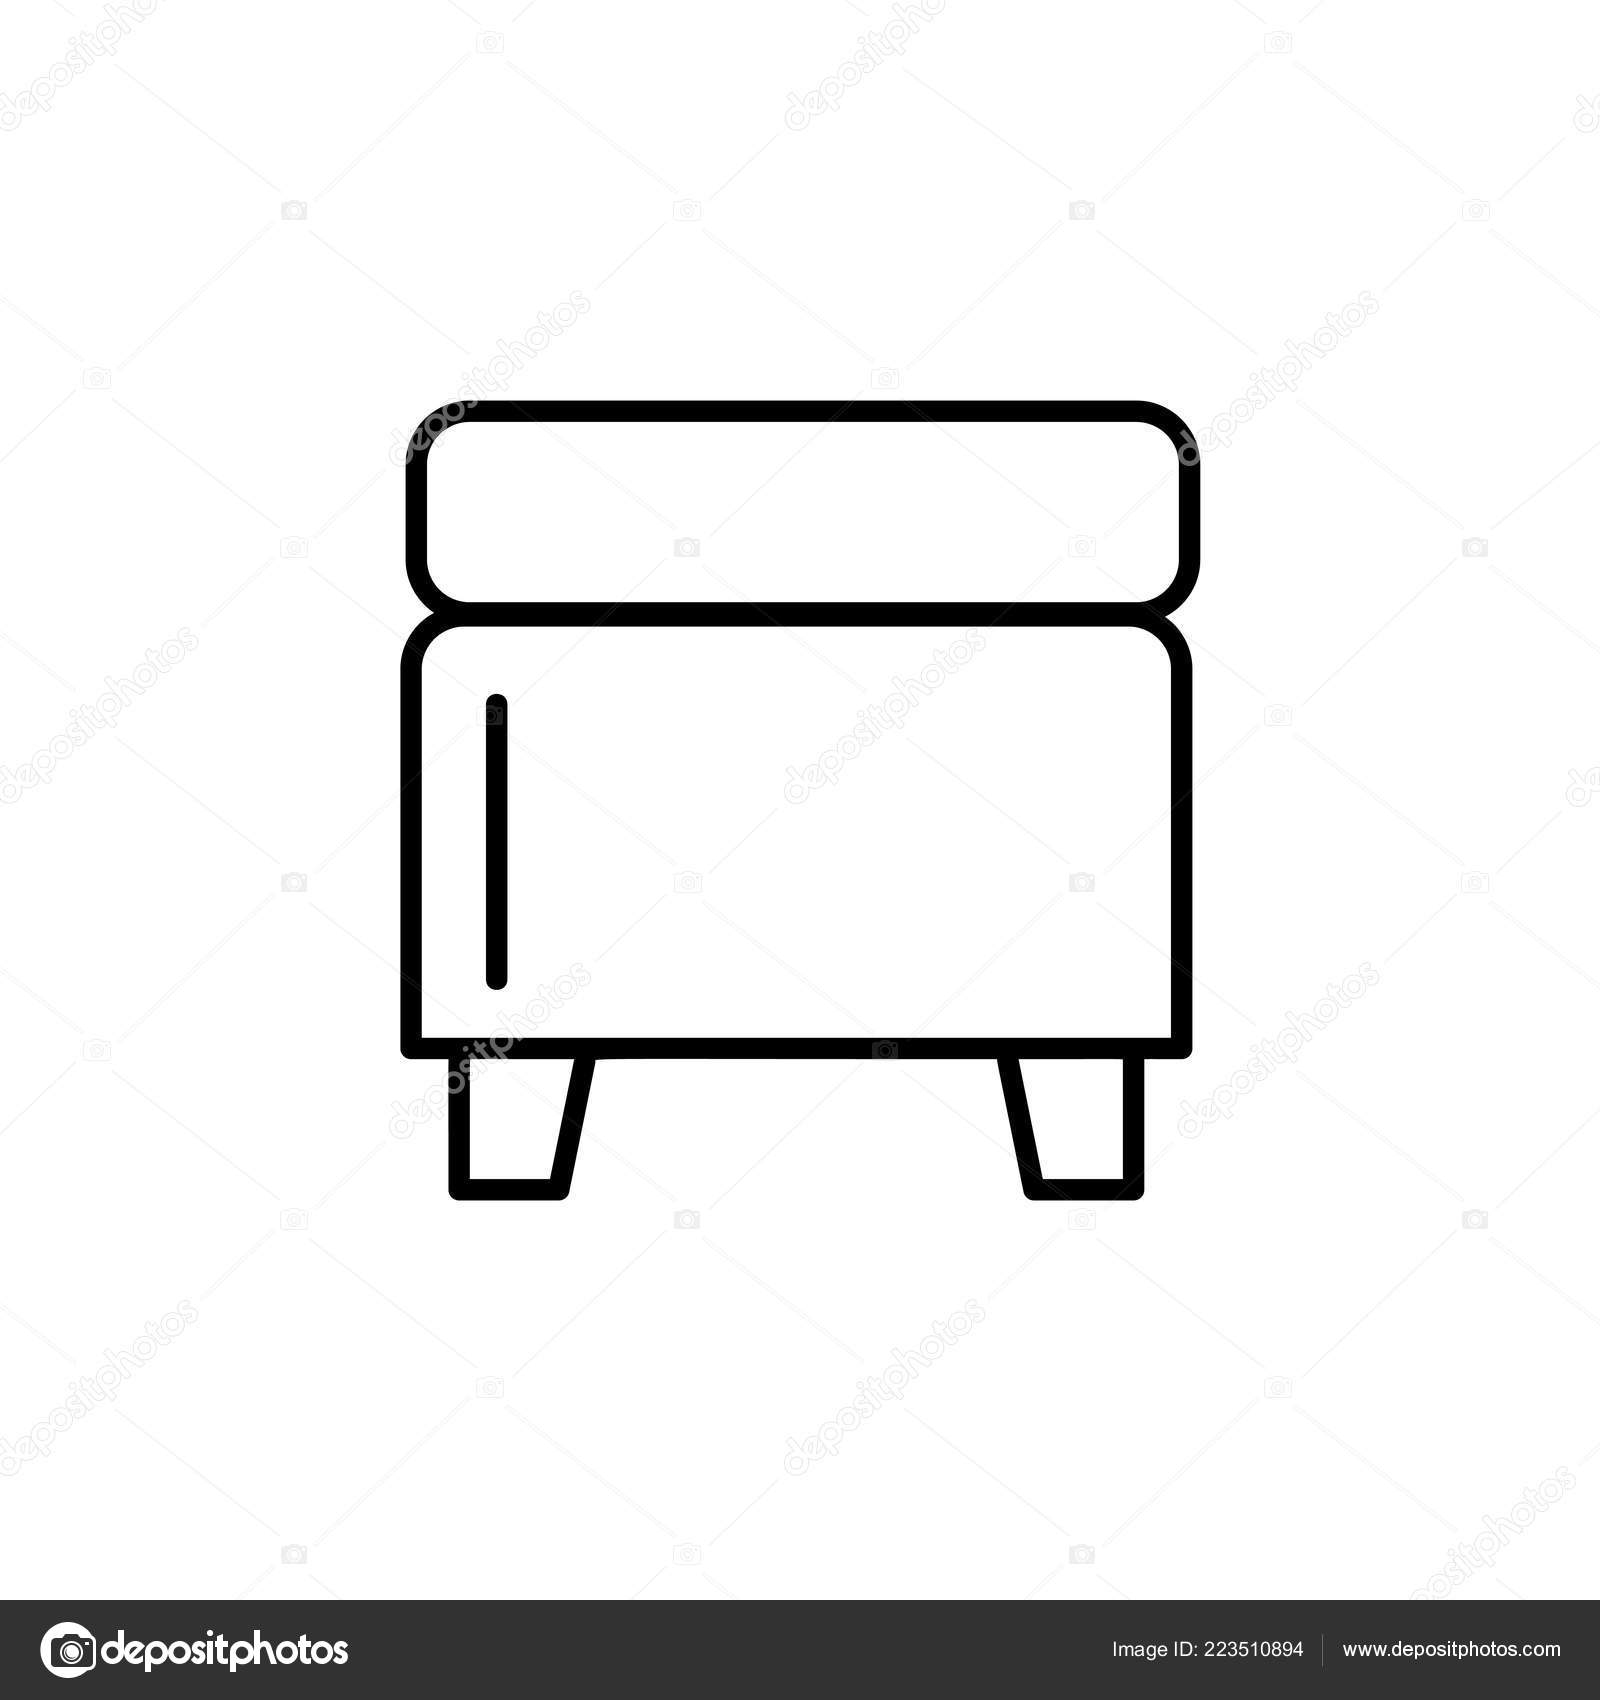 Magnificent Black White Vector Illustration Square Storage Ottoman Pouf Evergreenethics Interior Chair Design Evergreenethicsorg